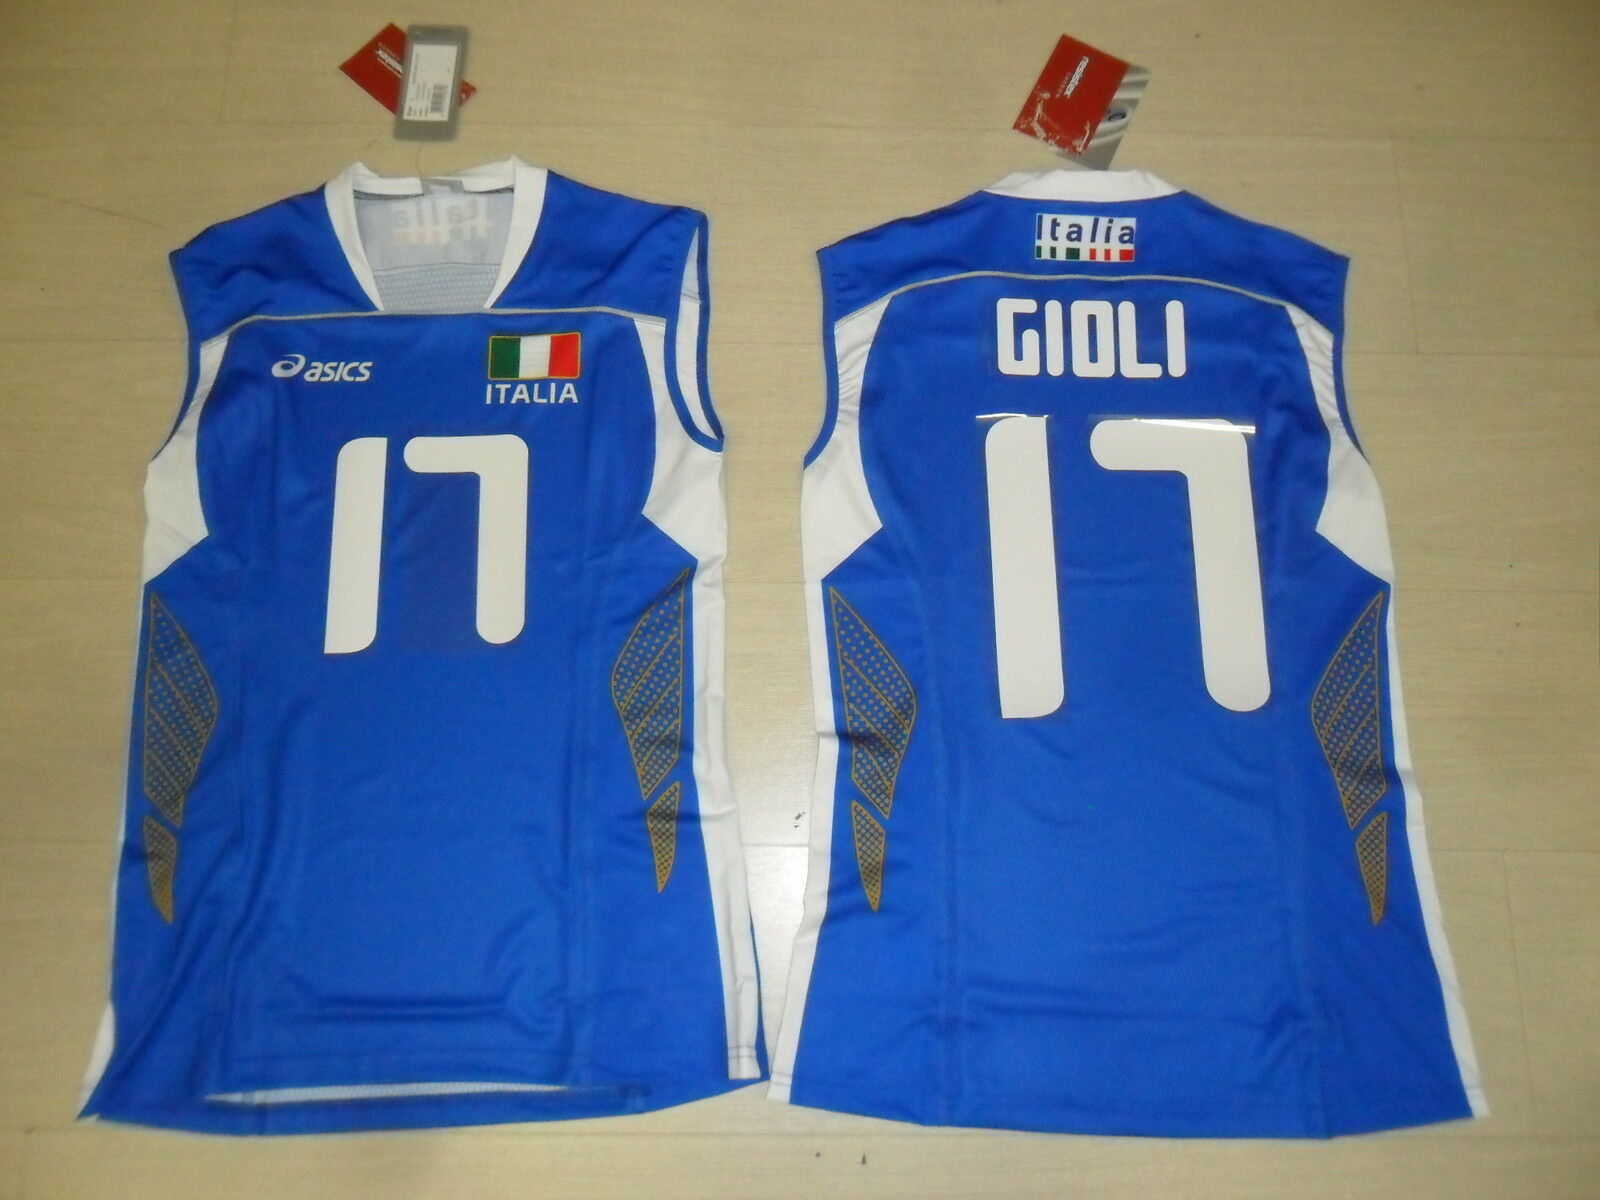 GRÖßE M GIOLI FIPAV ITALIEN ITALY VOLLEYBALL T-SHIRT OLYMPIADE OLYMPIADE OLYMPIADE DAMEN c0ab3e